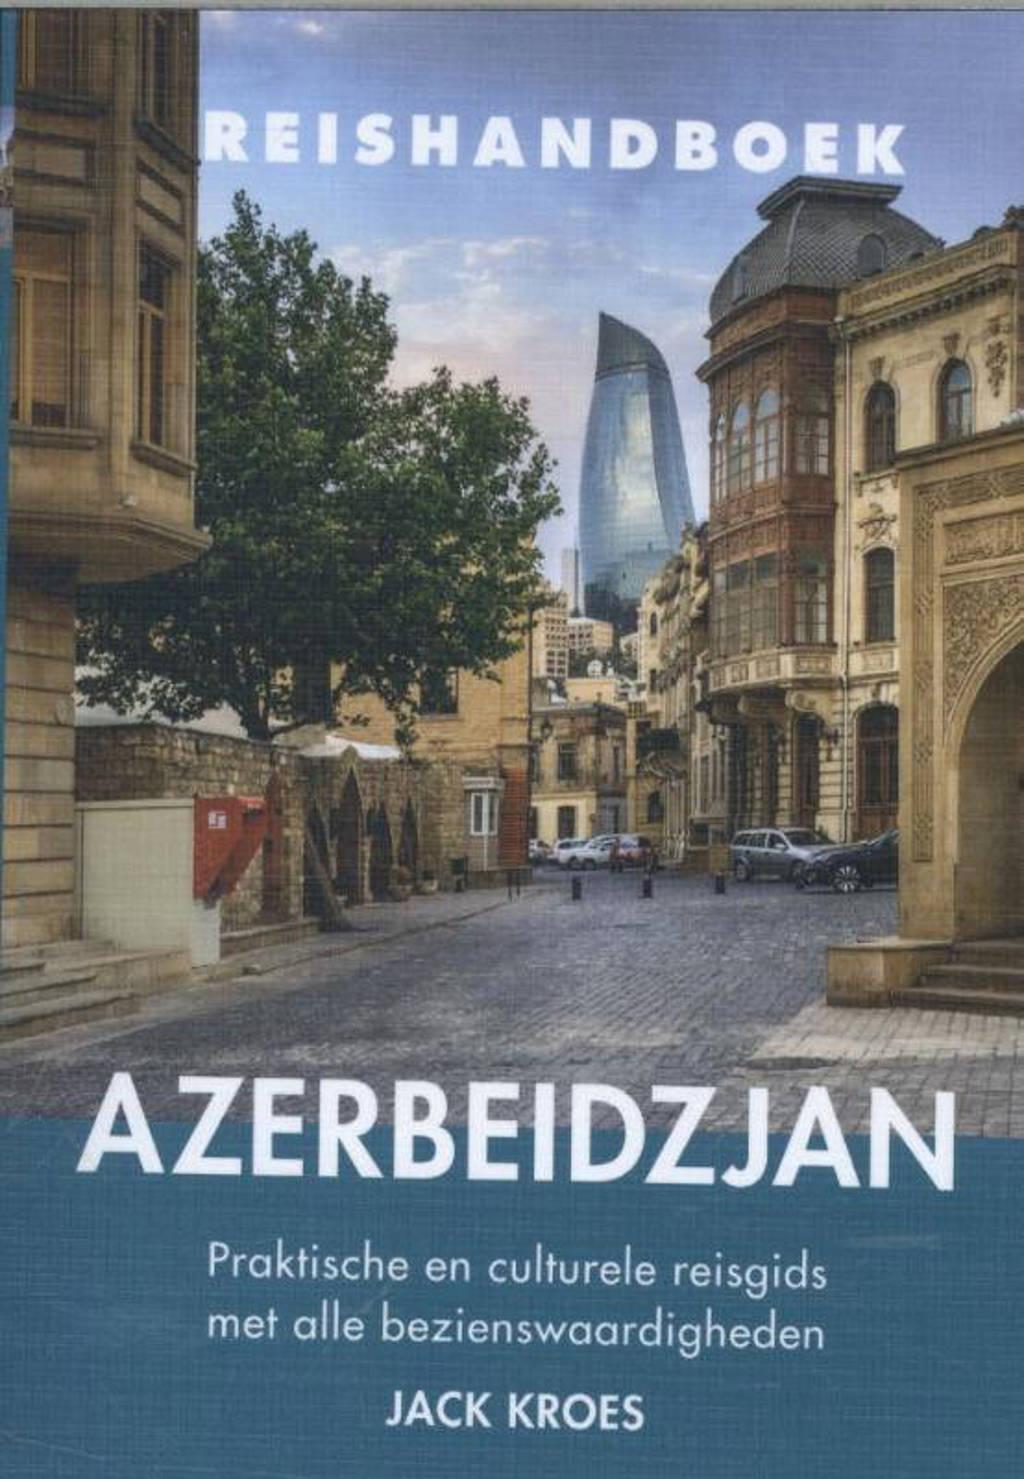 Reishandboek Azerbeidzjan - Jack Kroes